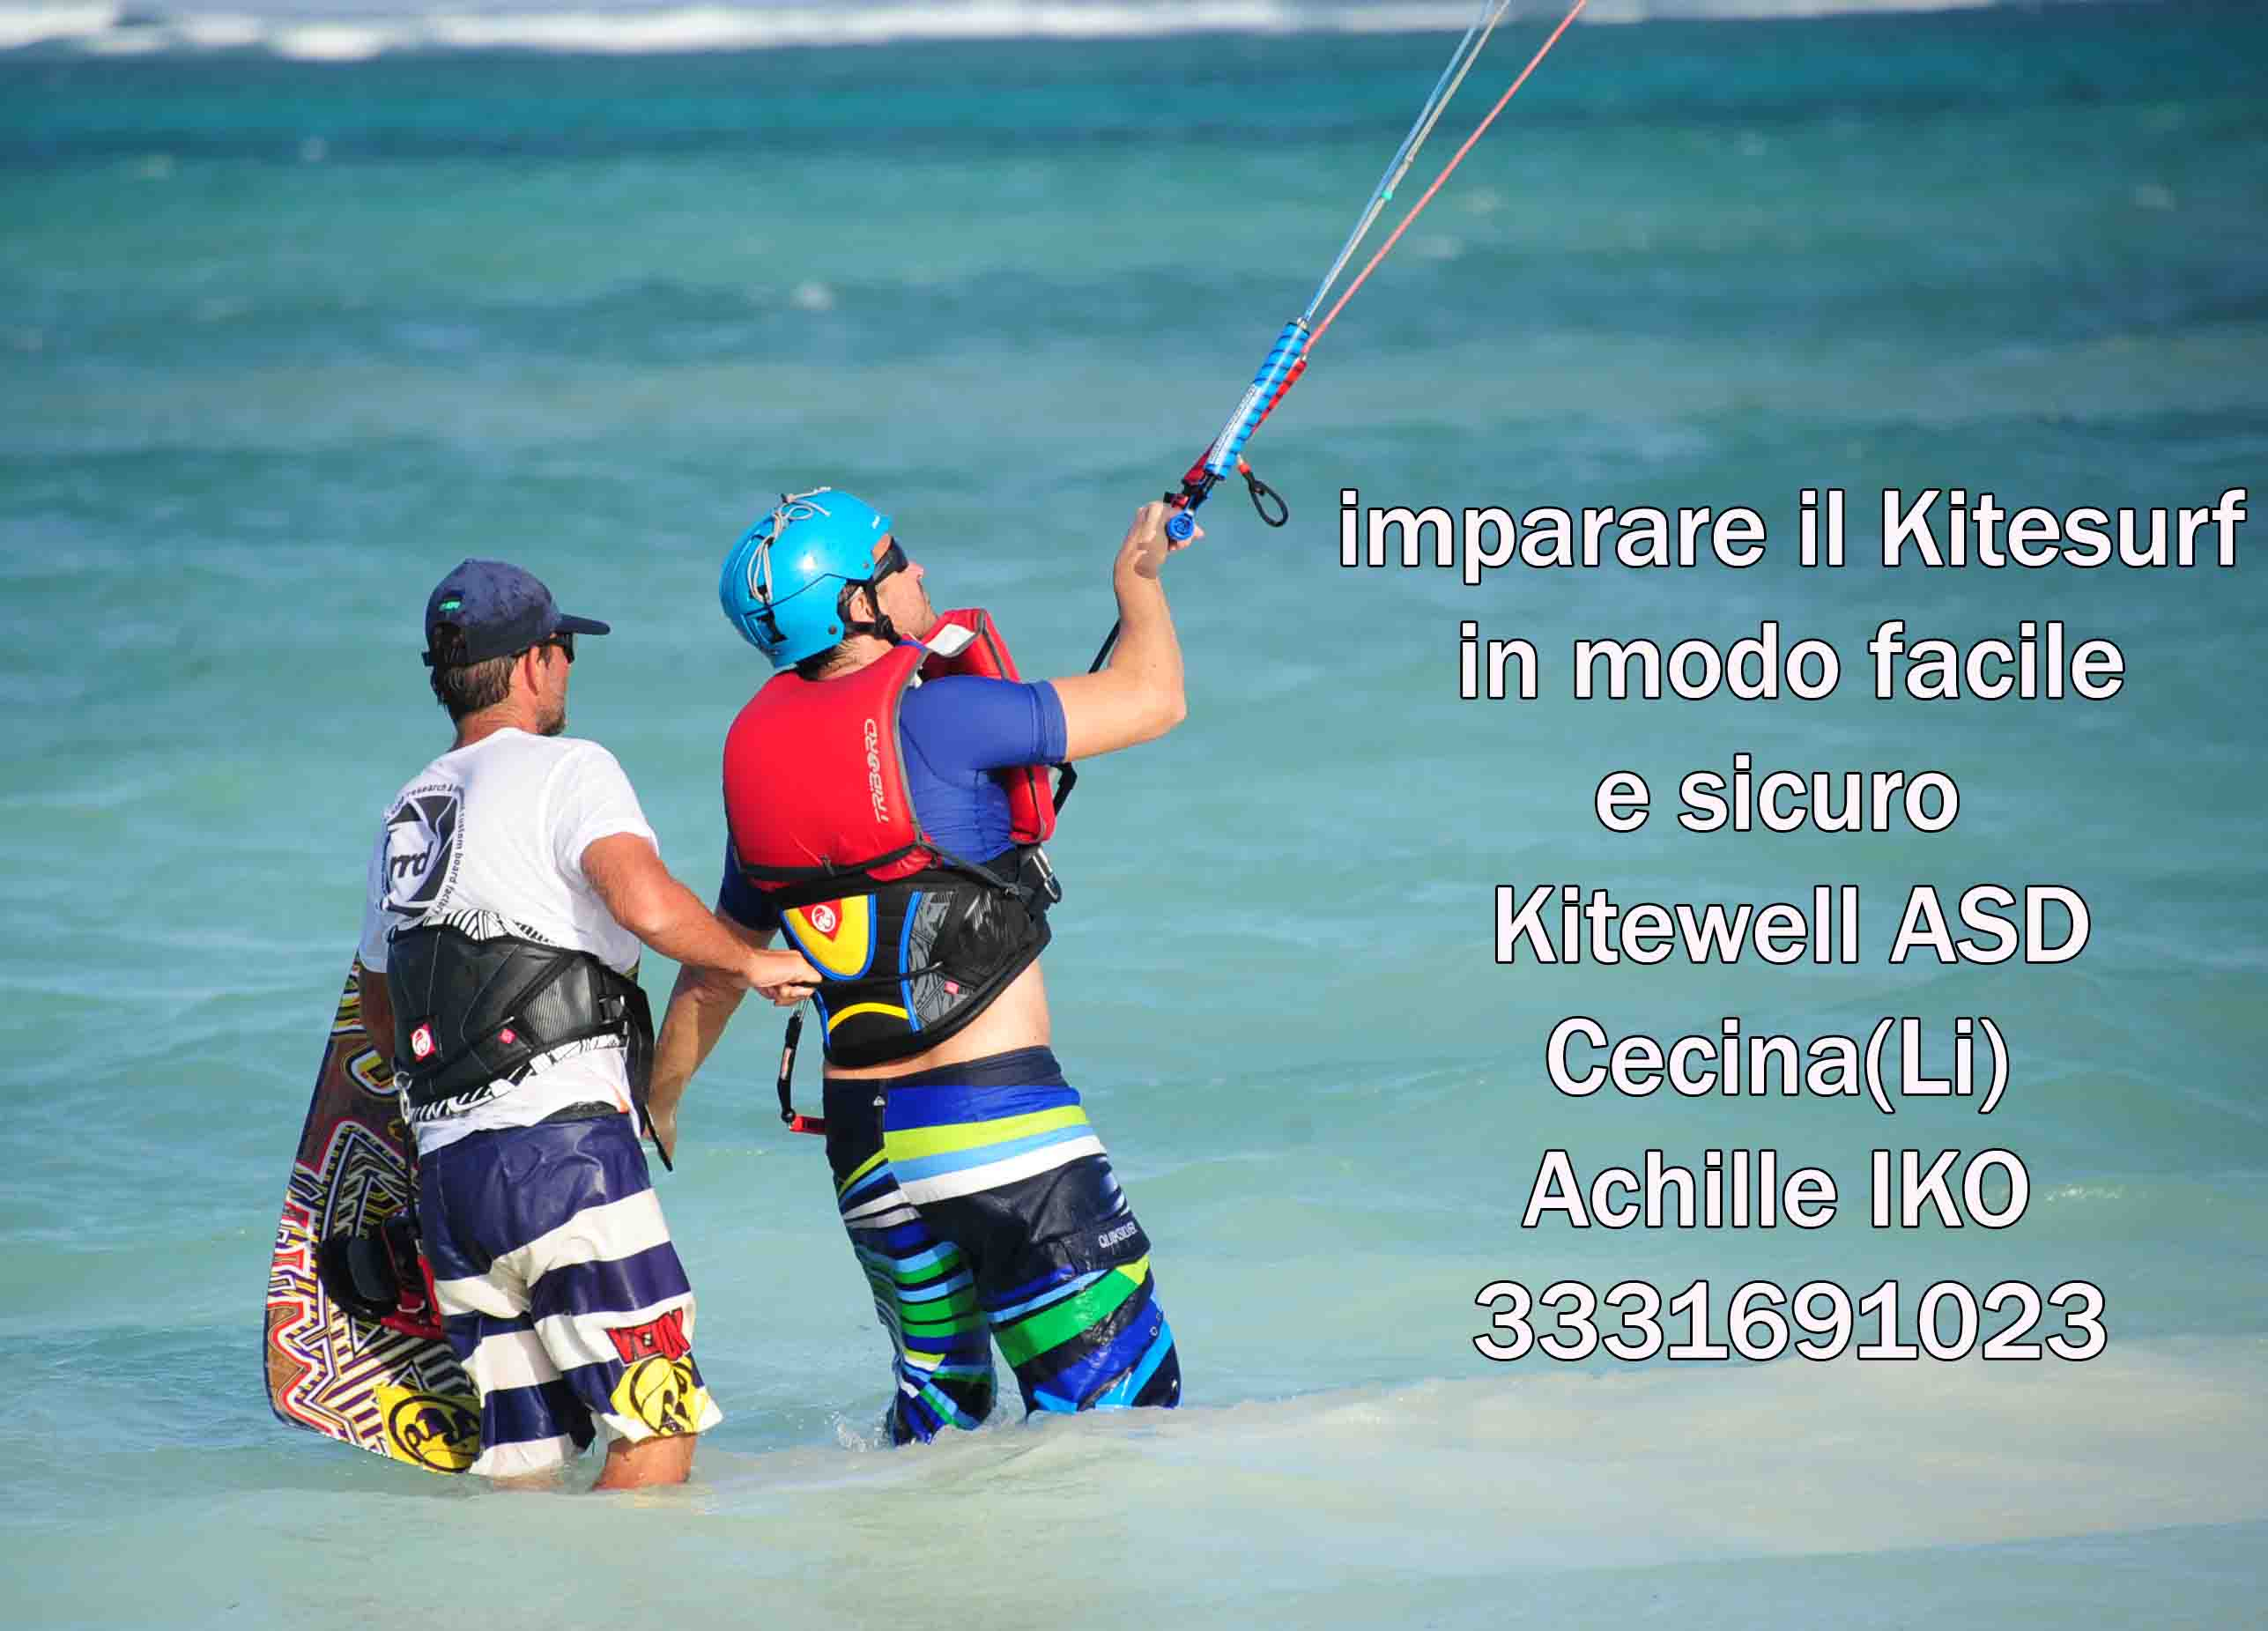 scuola-kitesurf-rosignano-vada-cecina-livorno-kitesurfing-trip-viaggio-zanzibar